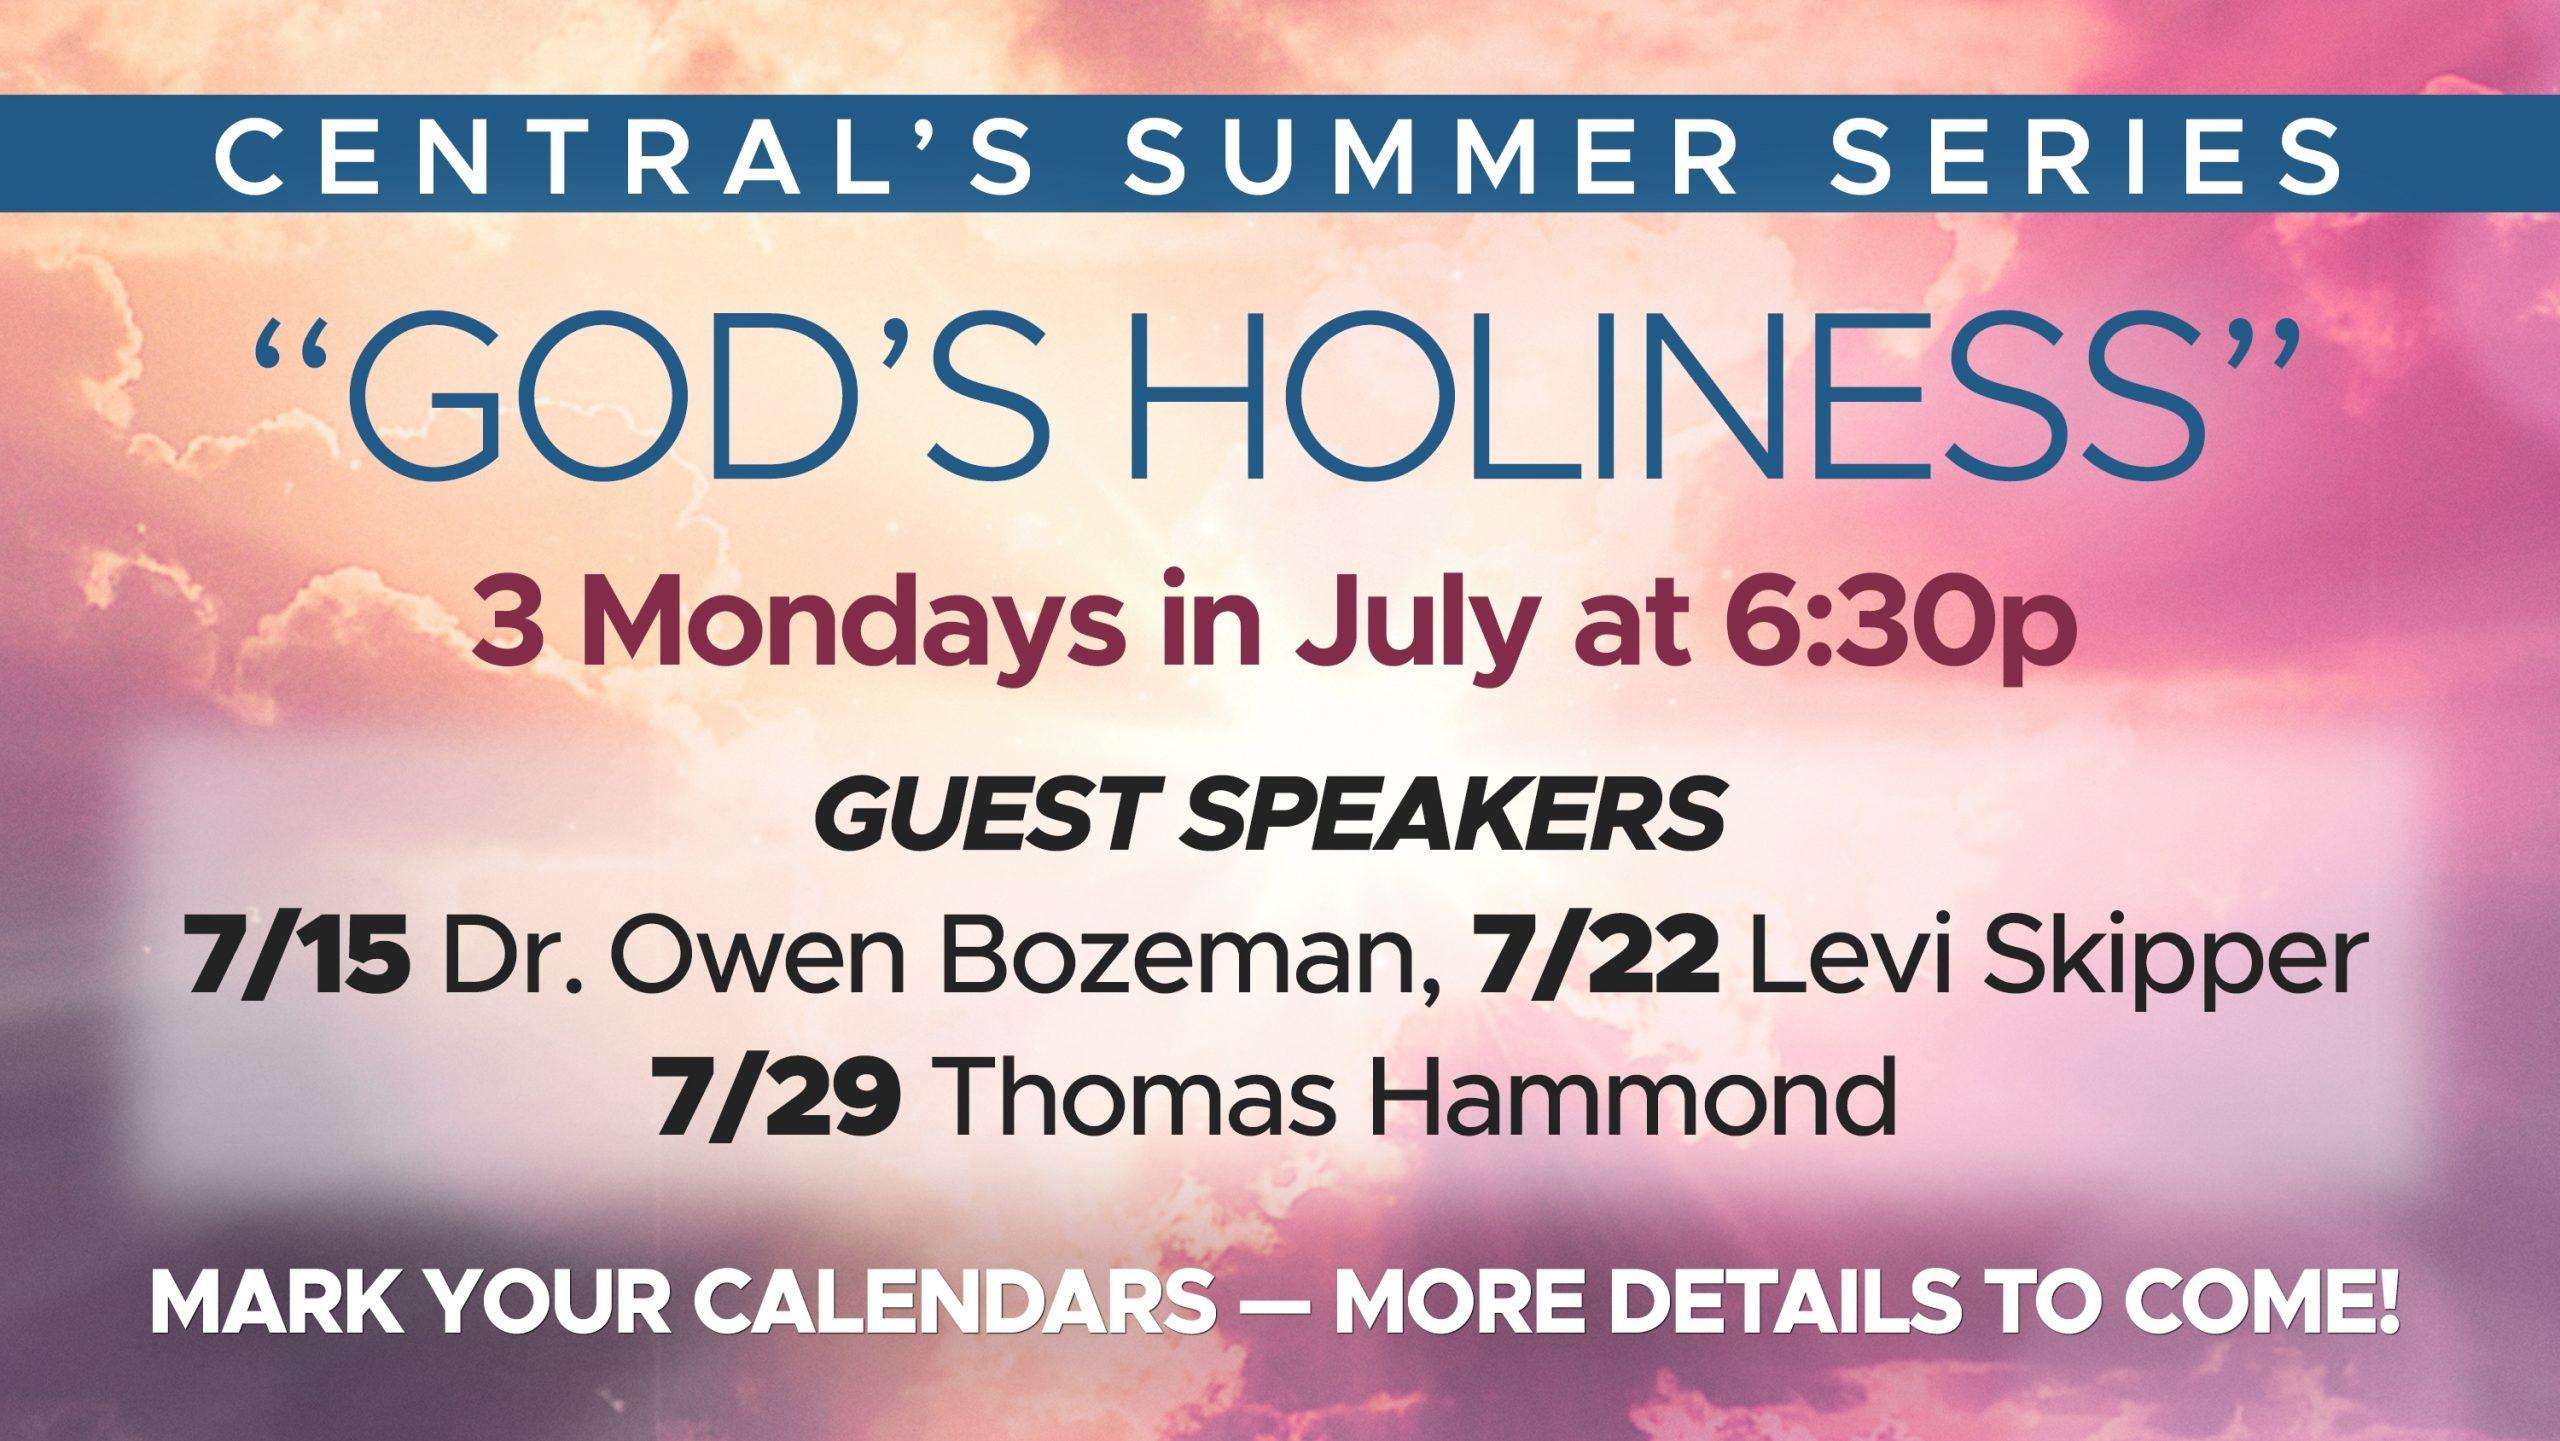 Central Baptist Church: Warner Robins, Ga > Central'S 2019 Summer Worship Series